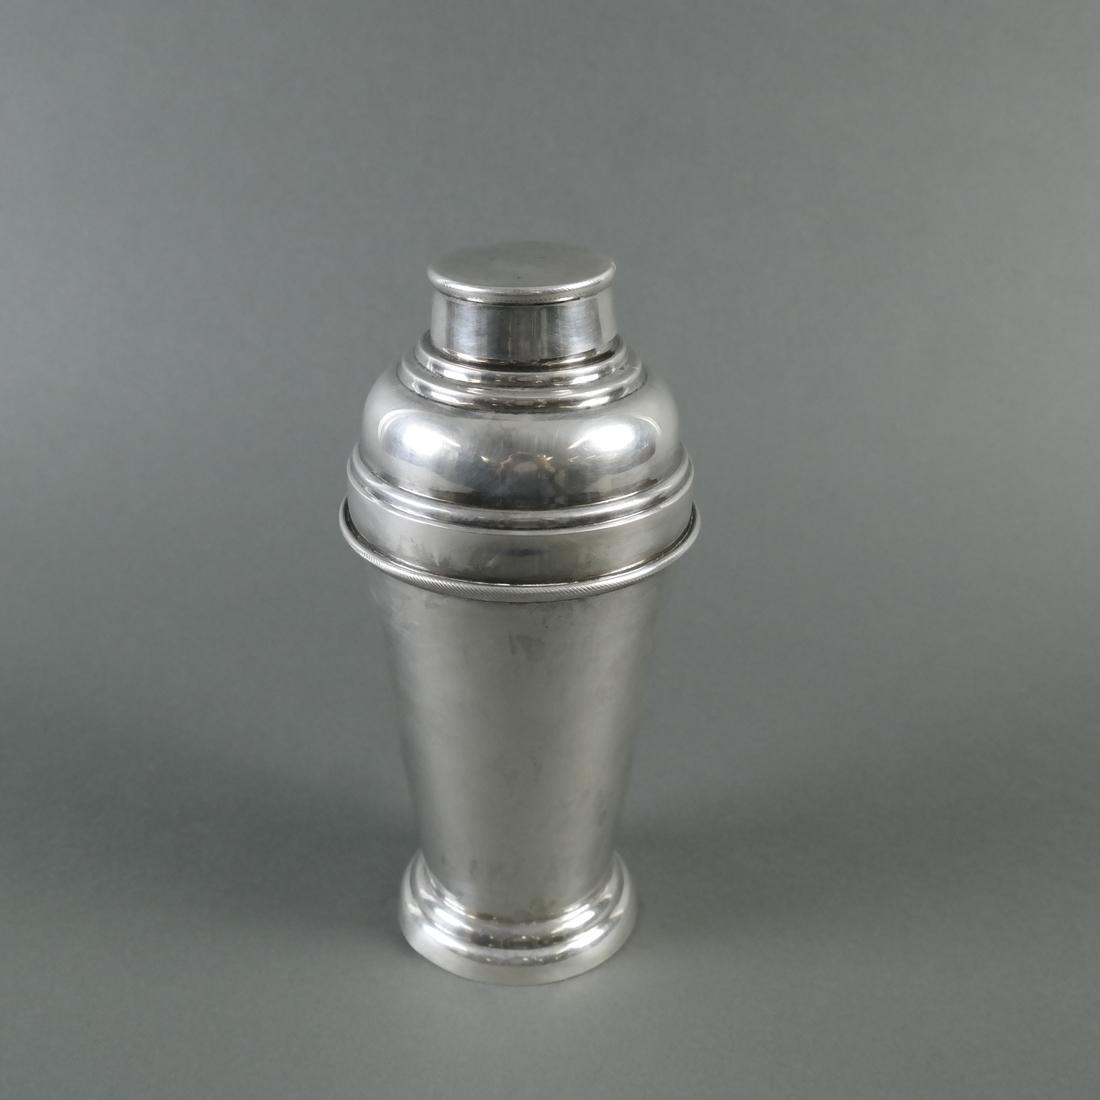 .900 Standard Silver Cocktail Shaker